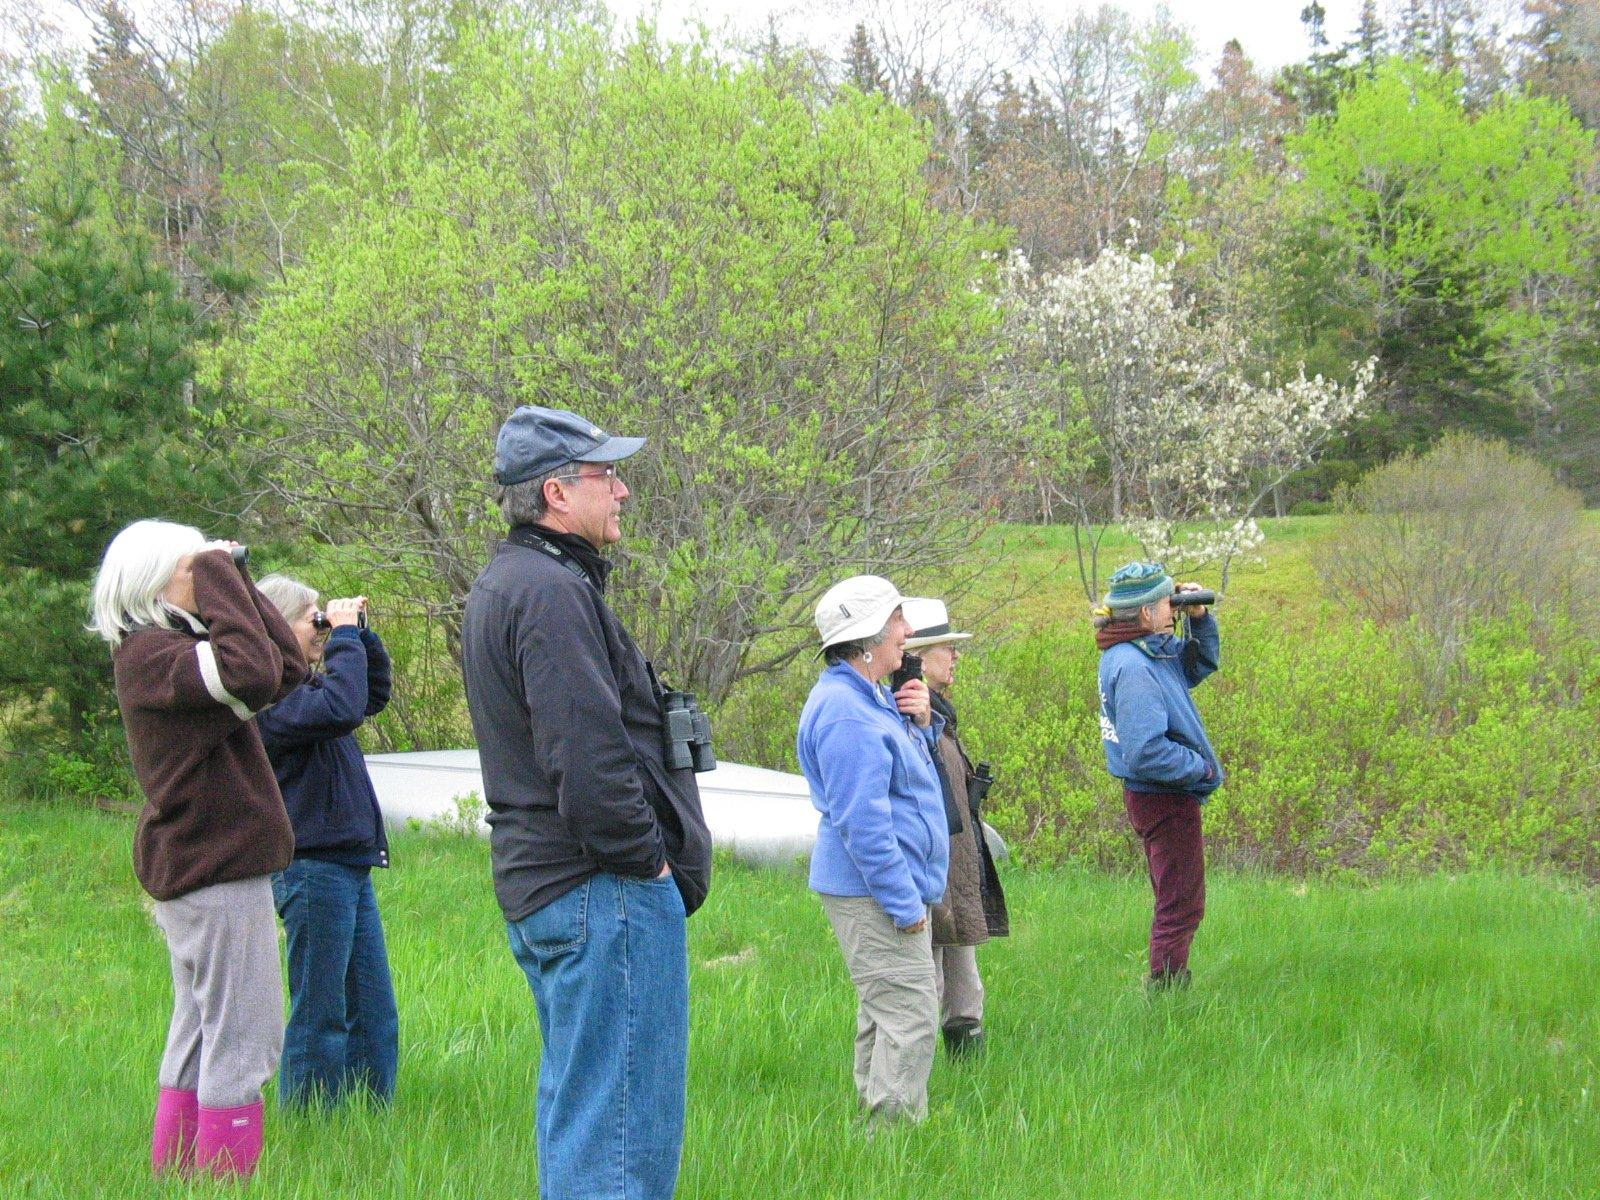 Birding Mariners Park with Bob Duchesne